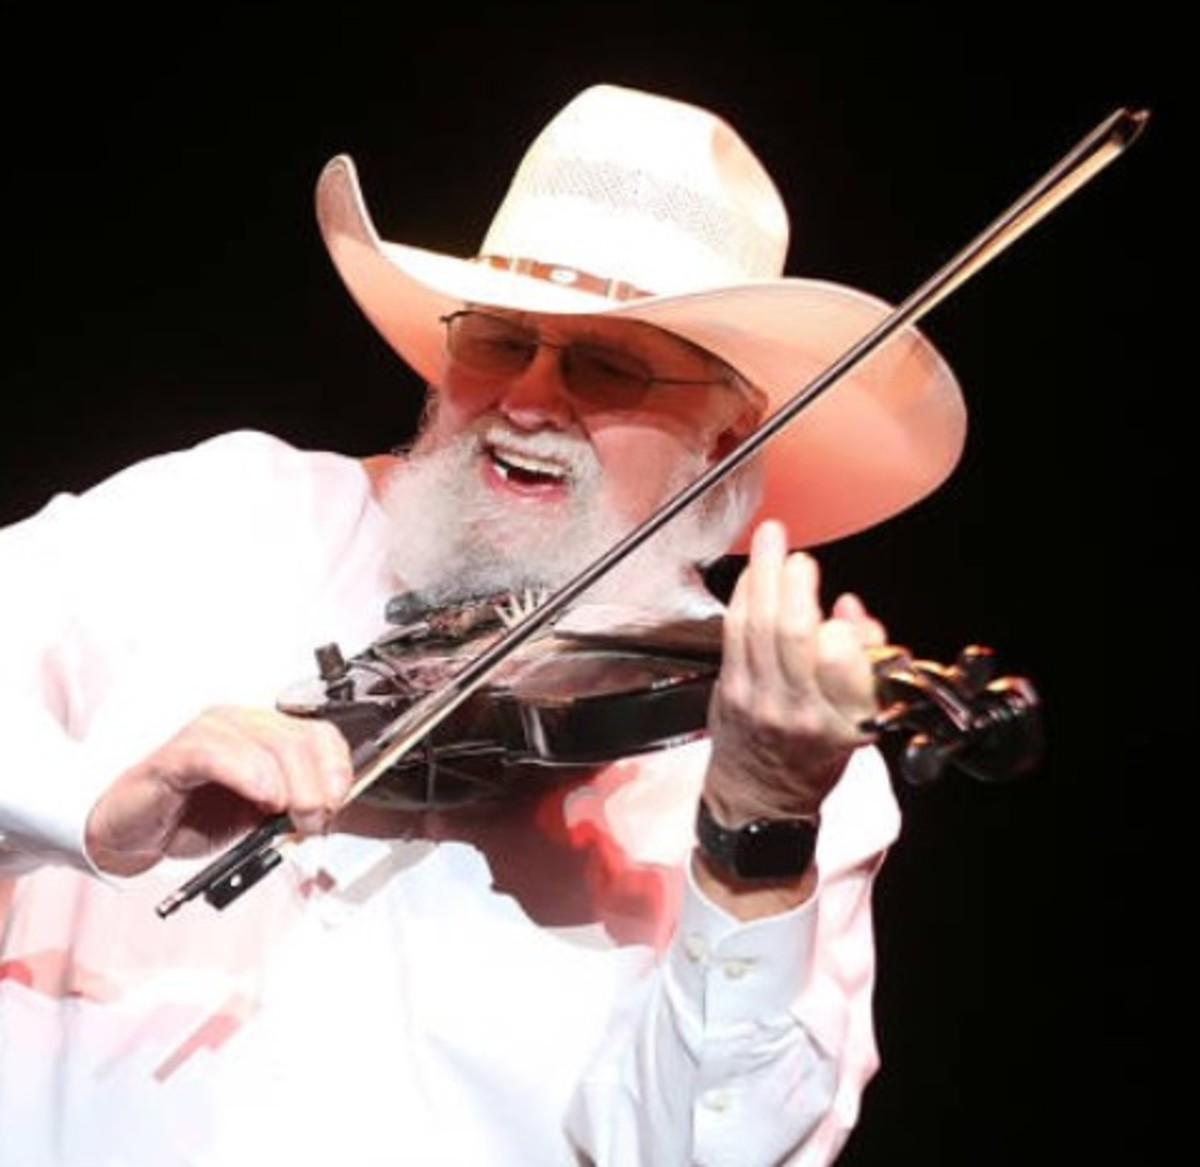 In concert, Cedar Park, Texas, Getty Images